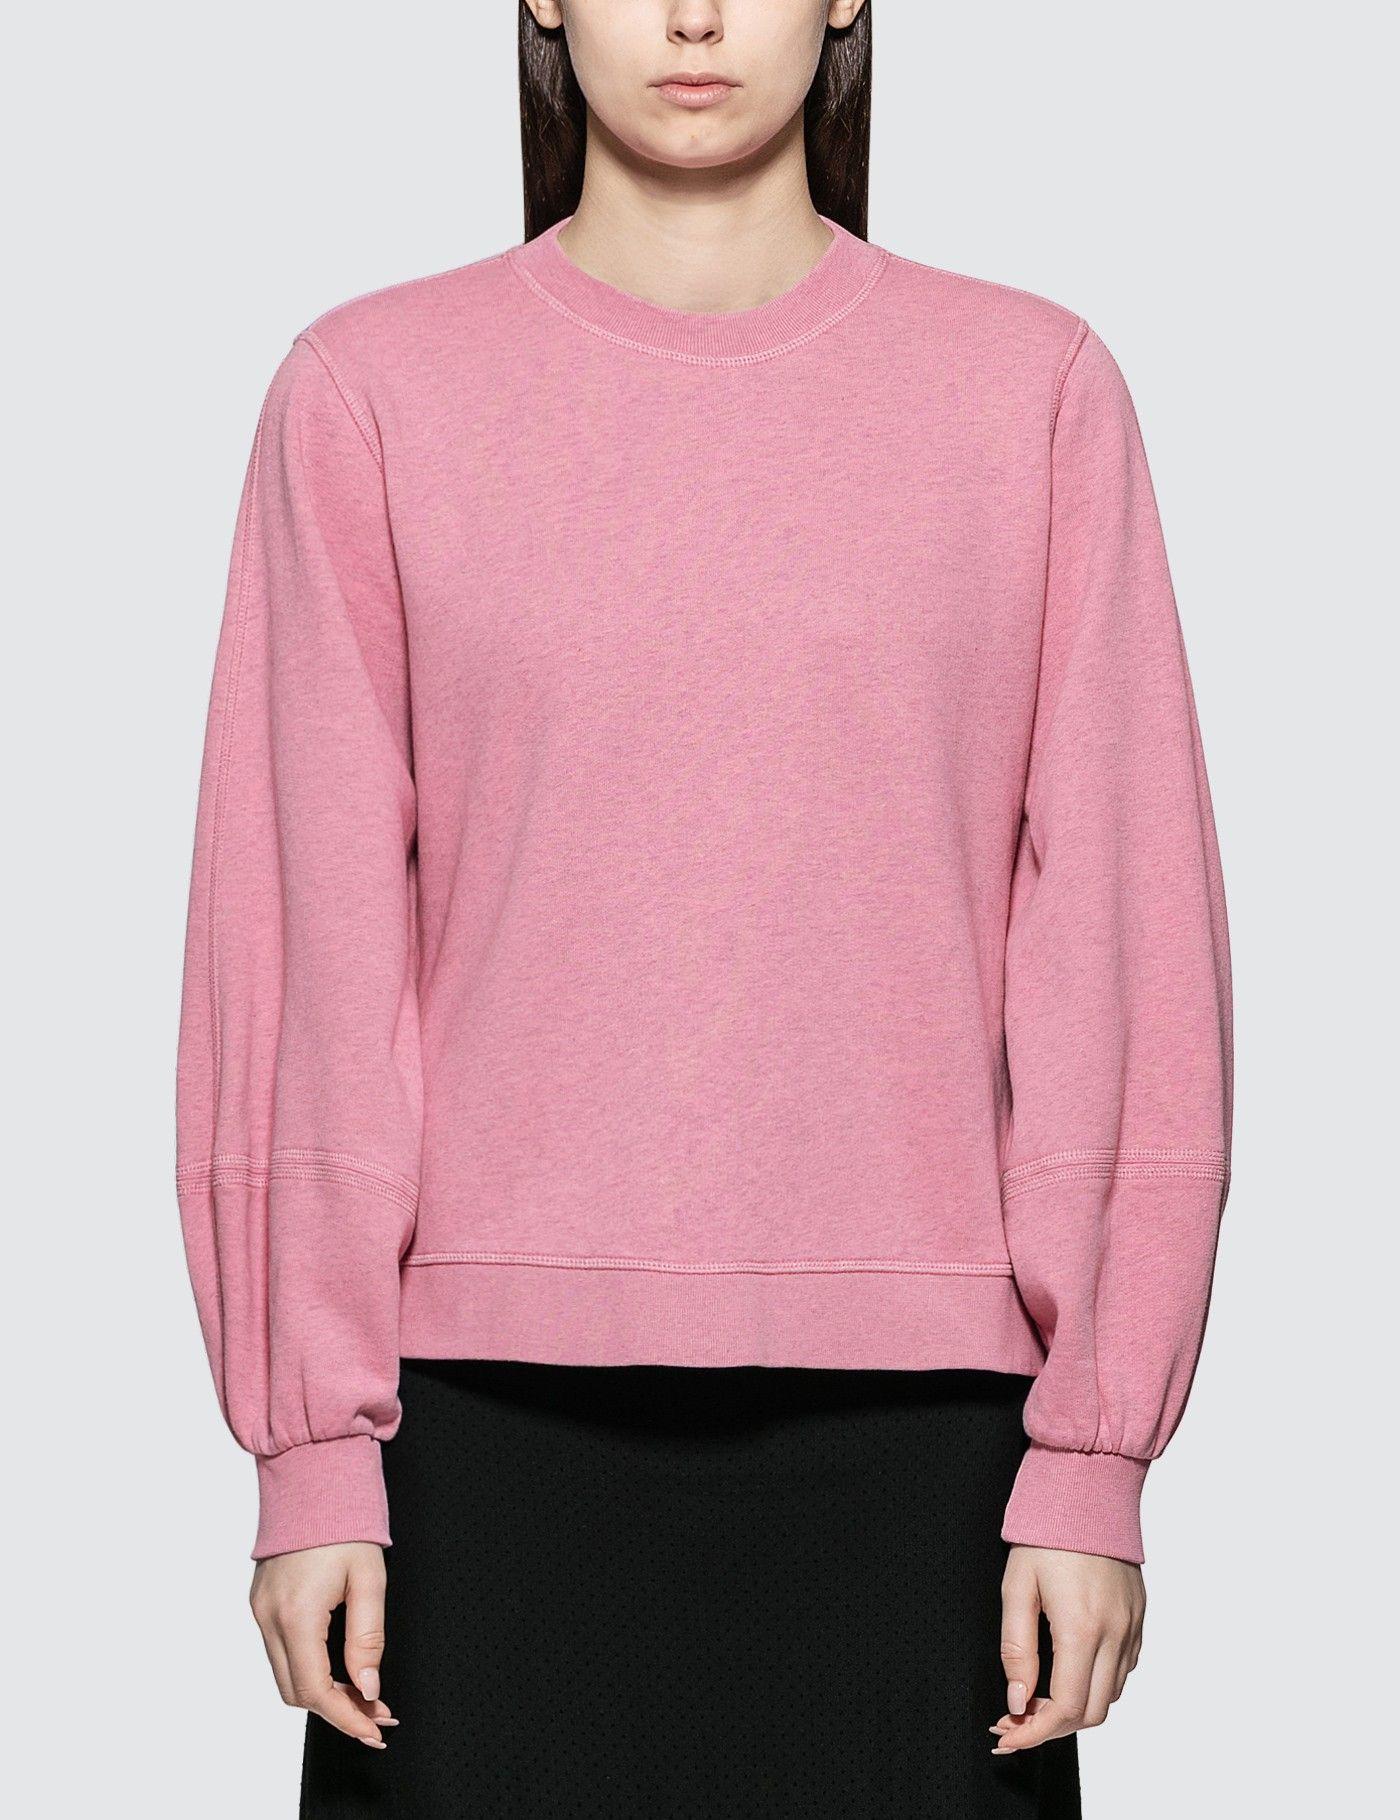 Ganni Isoli Sweatshirt Hbx Sweatshirts Shopping Outfit Fashion [ 1820 x 1400 Pixel ]